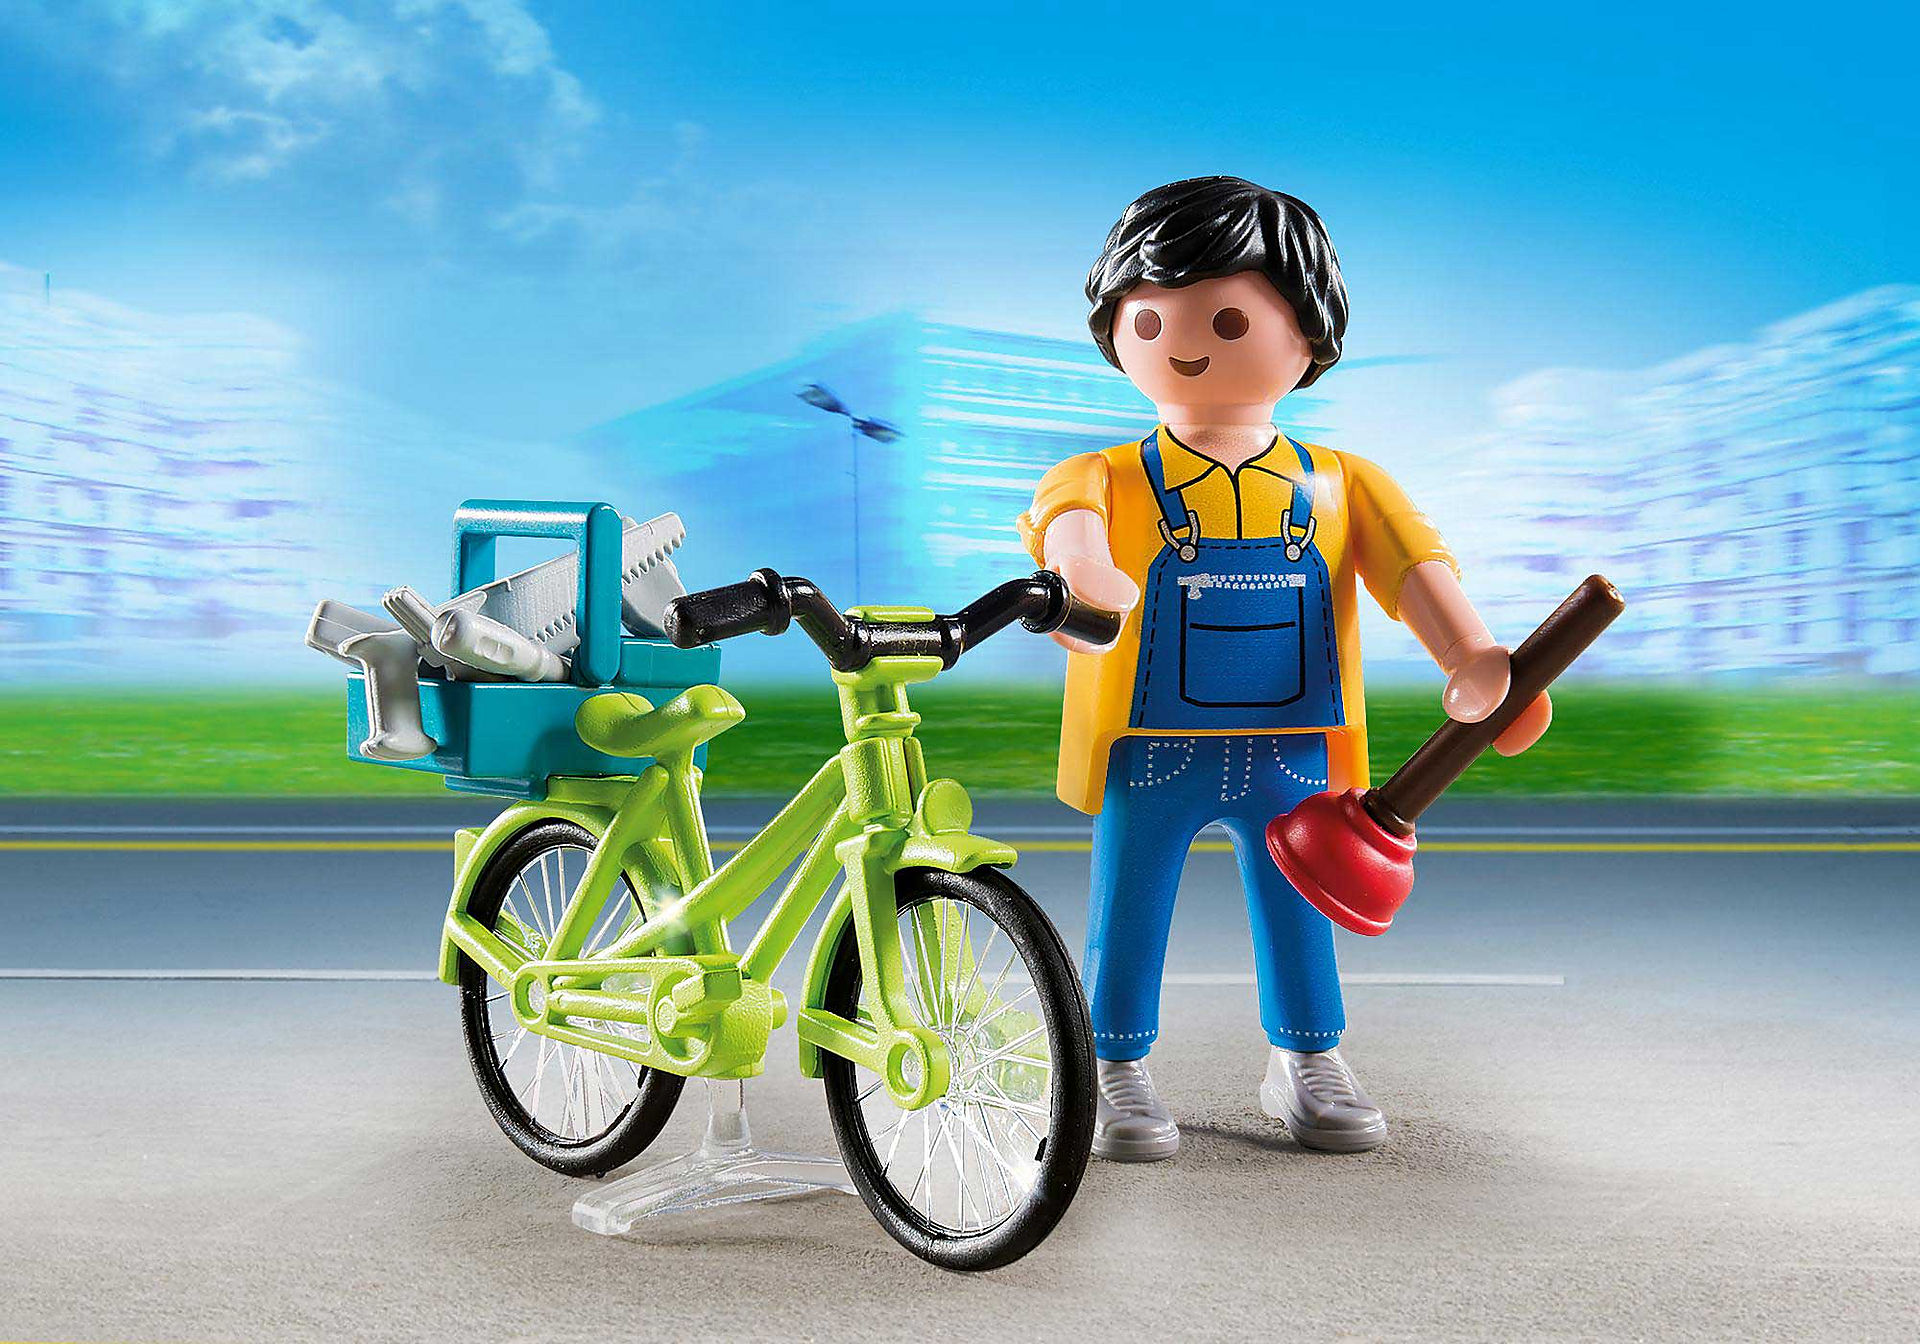 http://media.playmobil.com/i/playmobil/4791_product_detail/Empleado de Mantenimiento